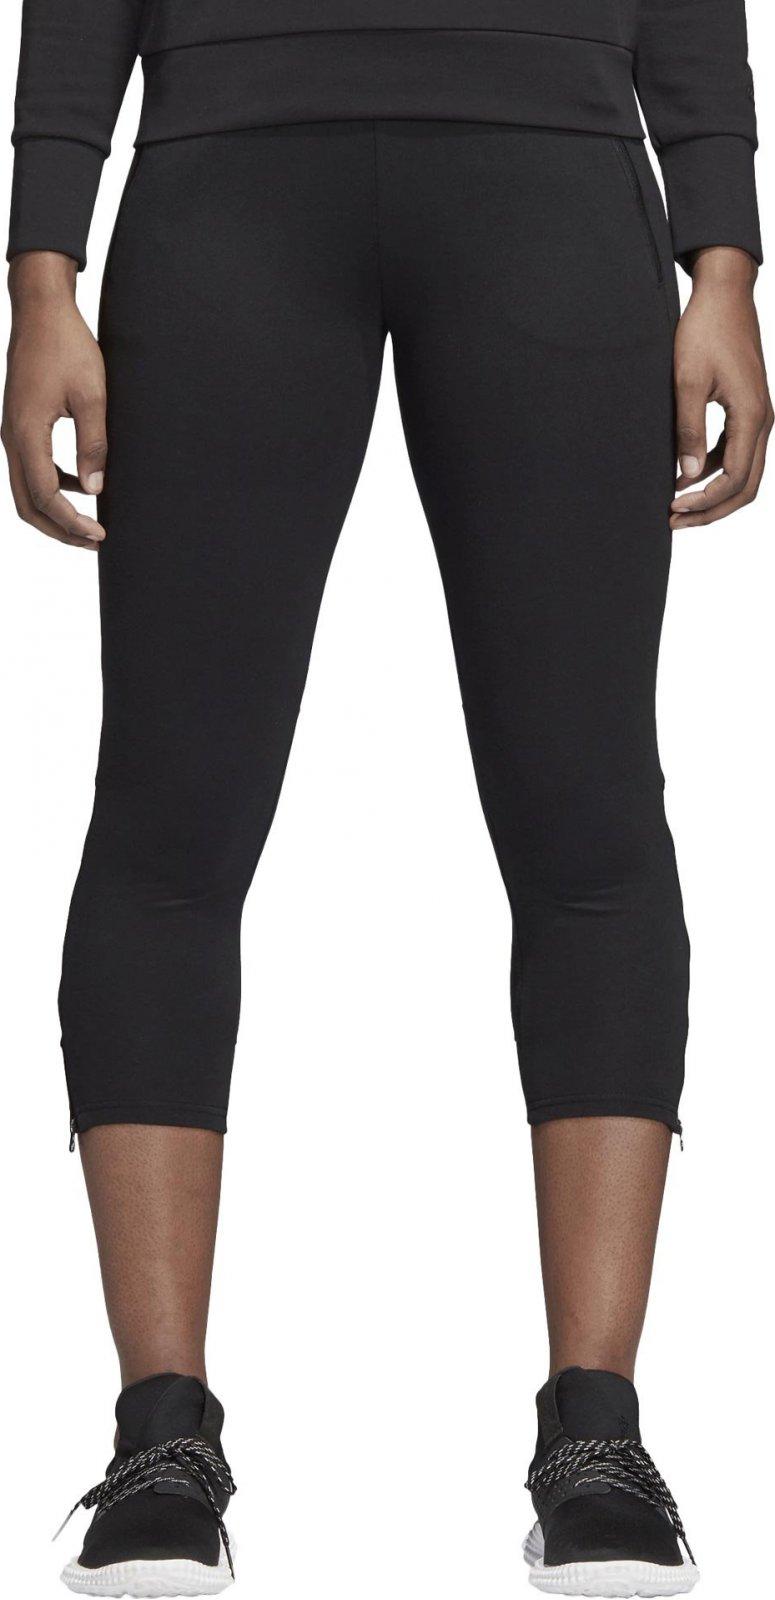 Adidas ID Glory 7 8 Skinny Pants Black Carbon • Zboží.cz 6ded3458ac